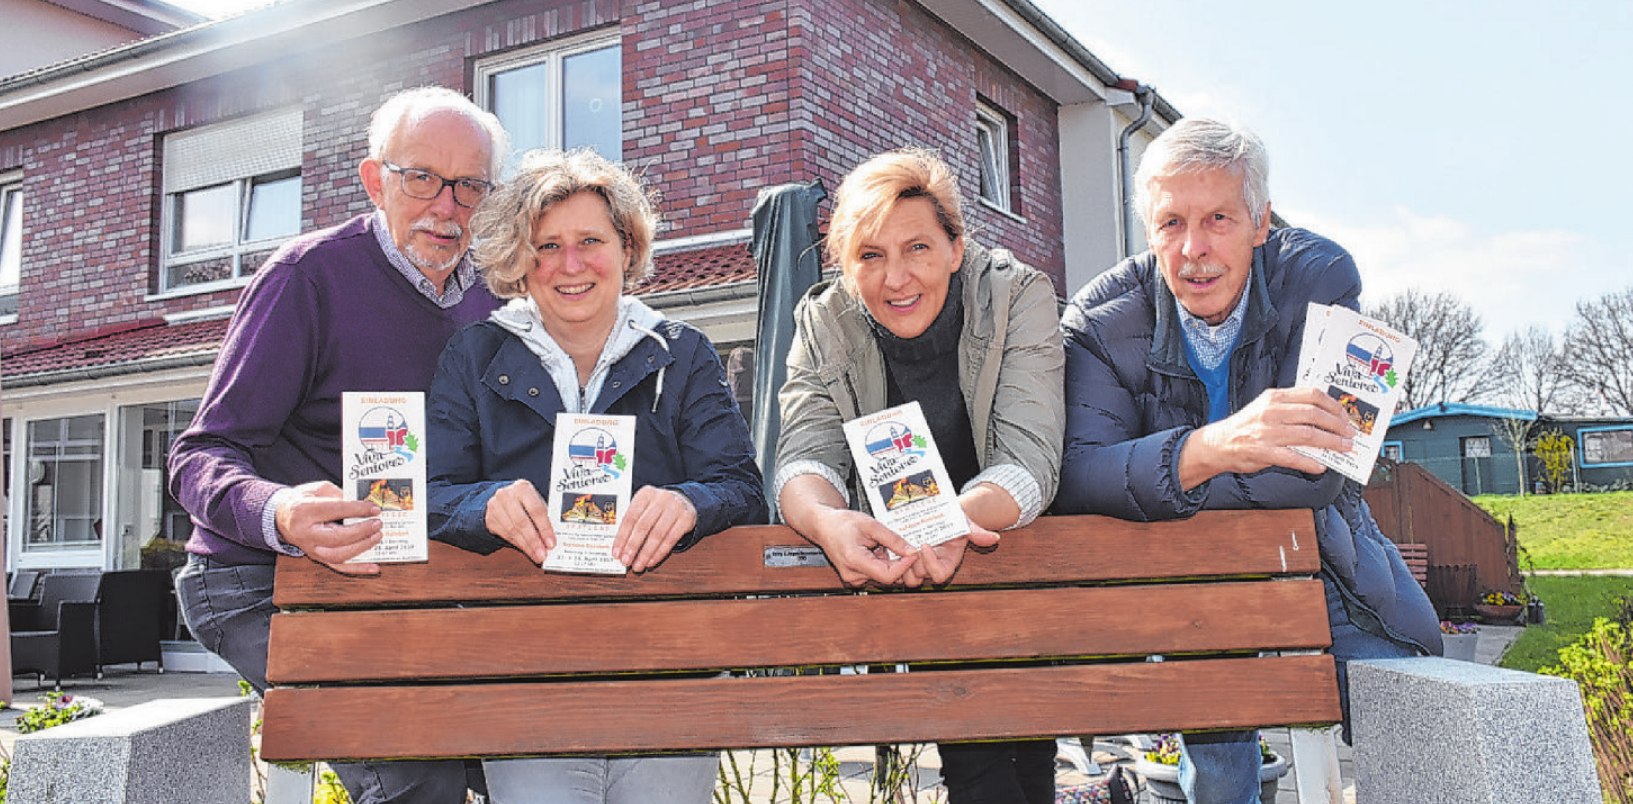 Rolf Loose (v.l.), Susann Pötter, Anke Conradi und Kurt Martens organisieren die Seniorenmesse im Reinbeker Schloss Foto: Soukup